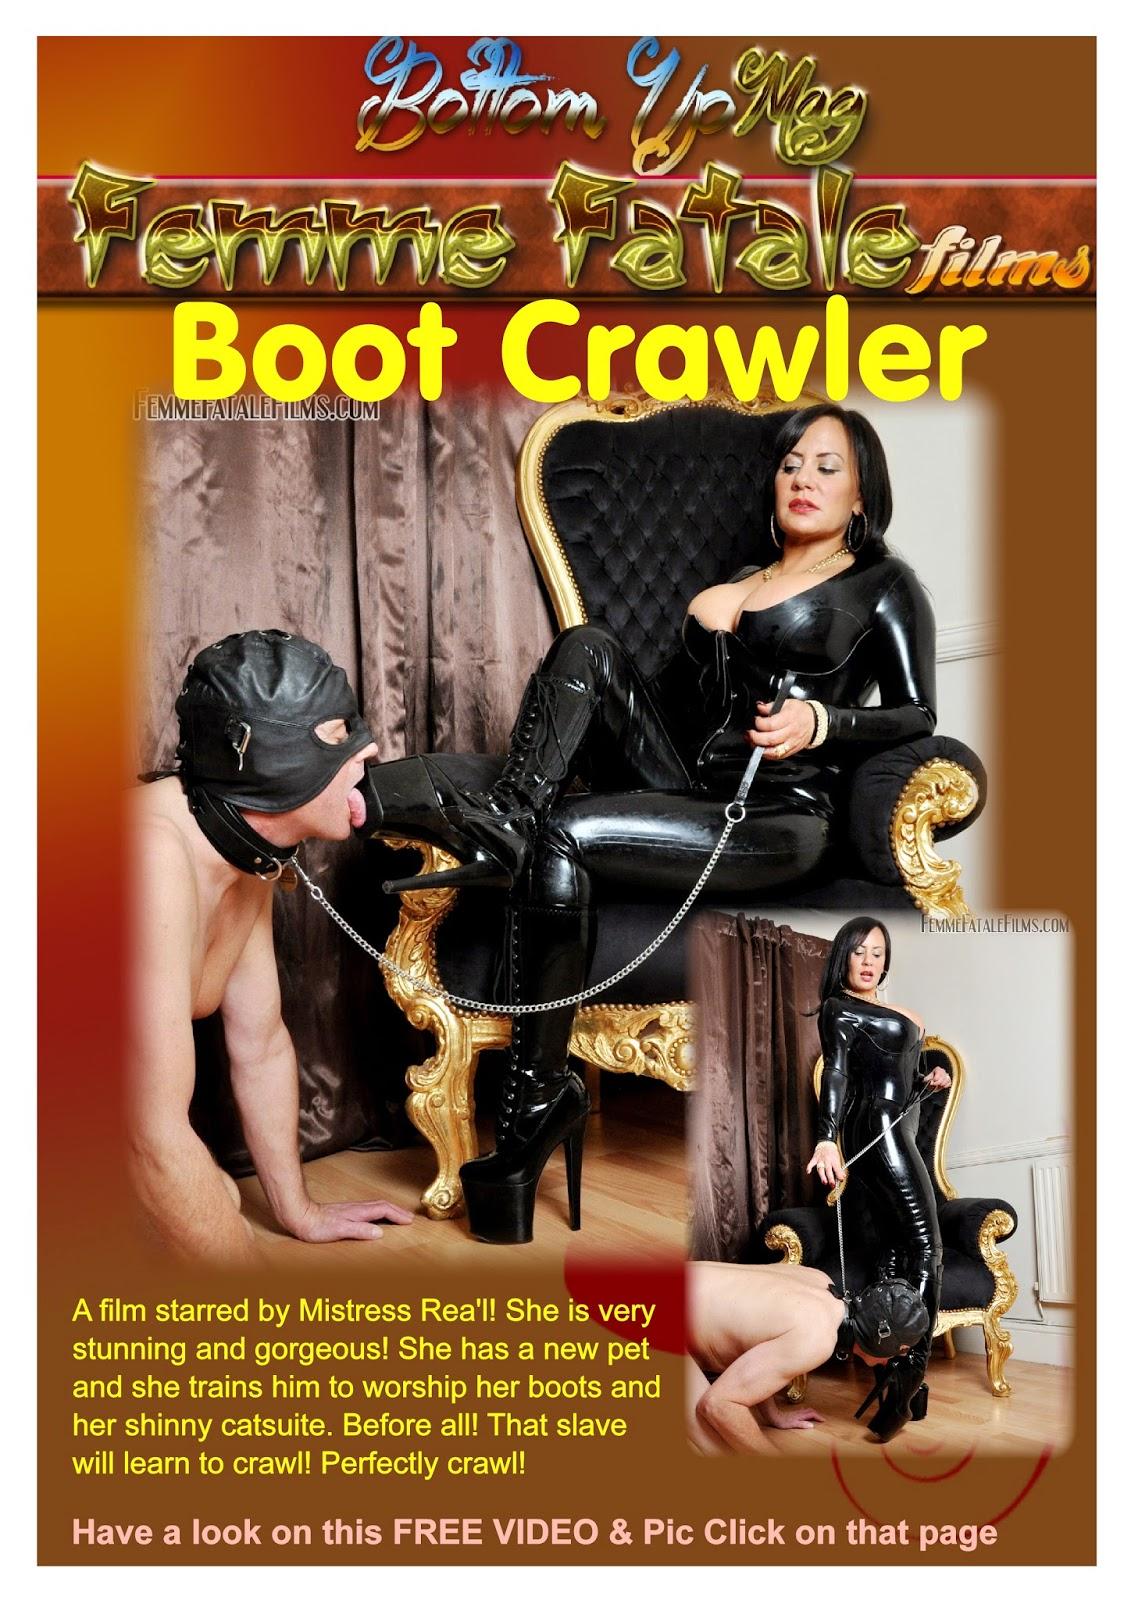 http://www.femmefatalefilms.com/affiliate/promo/e3540f/1/798/774138/